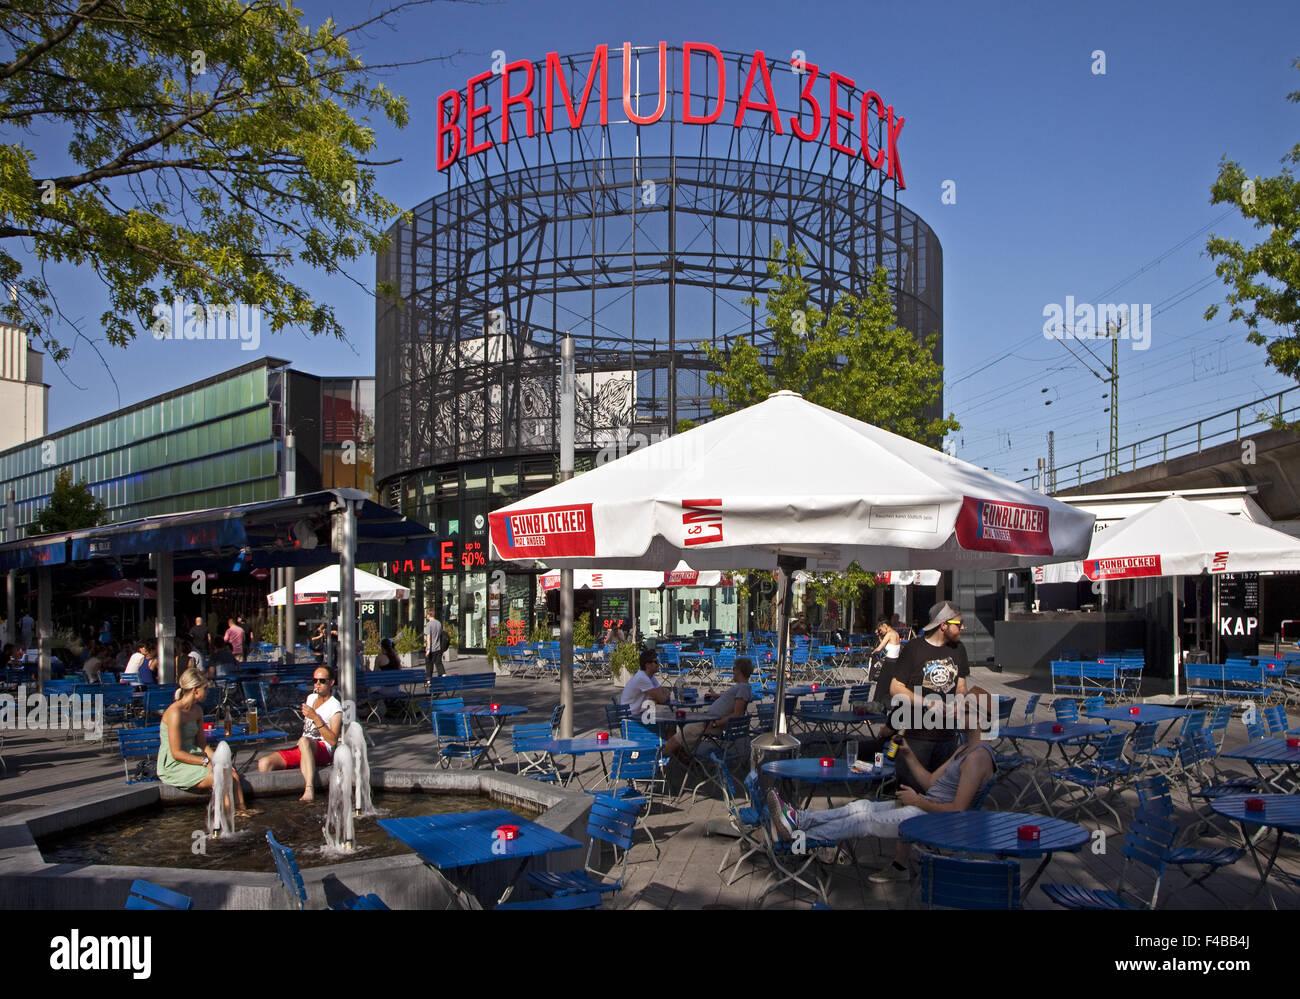 Scene quarter Bermuda Triangle, Bochum. - Stock Image